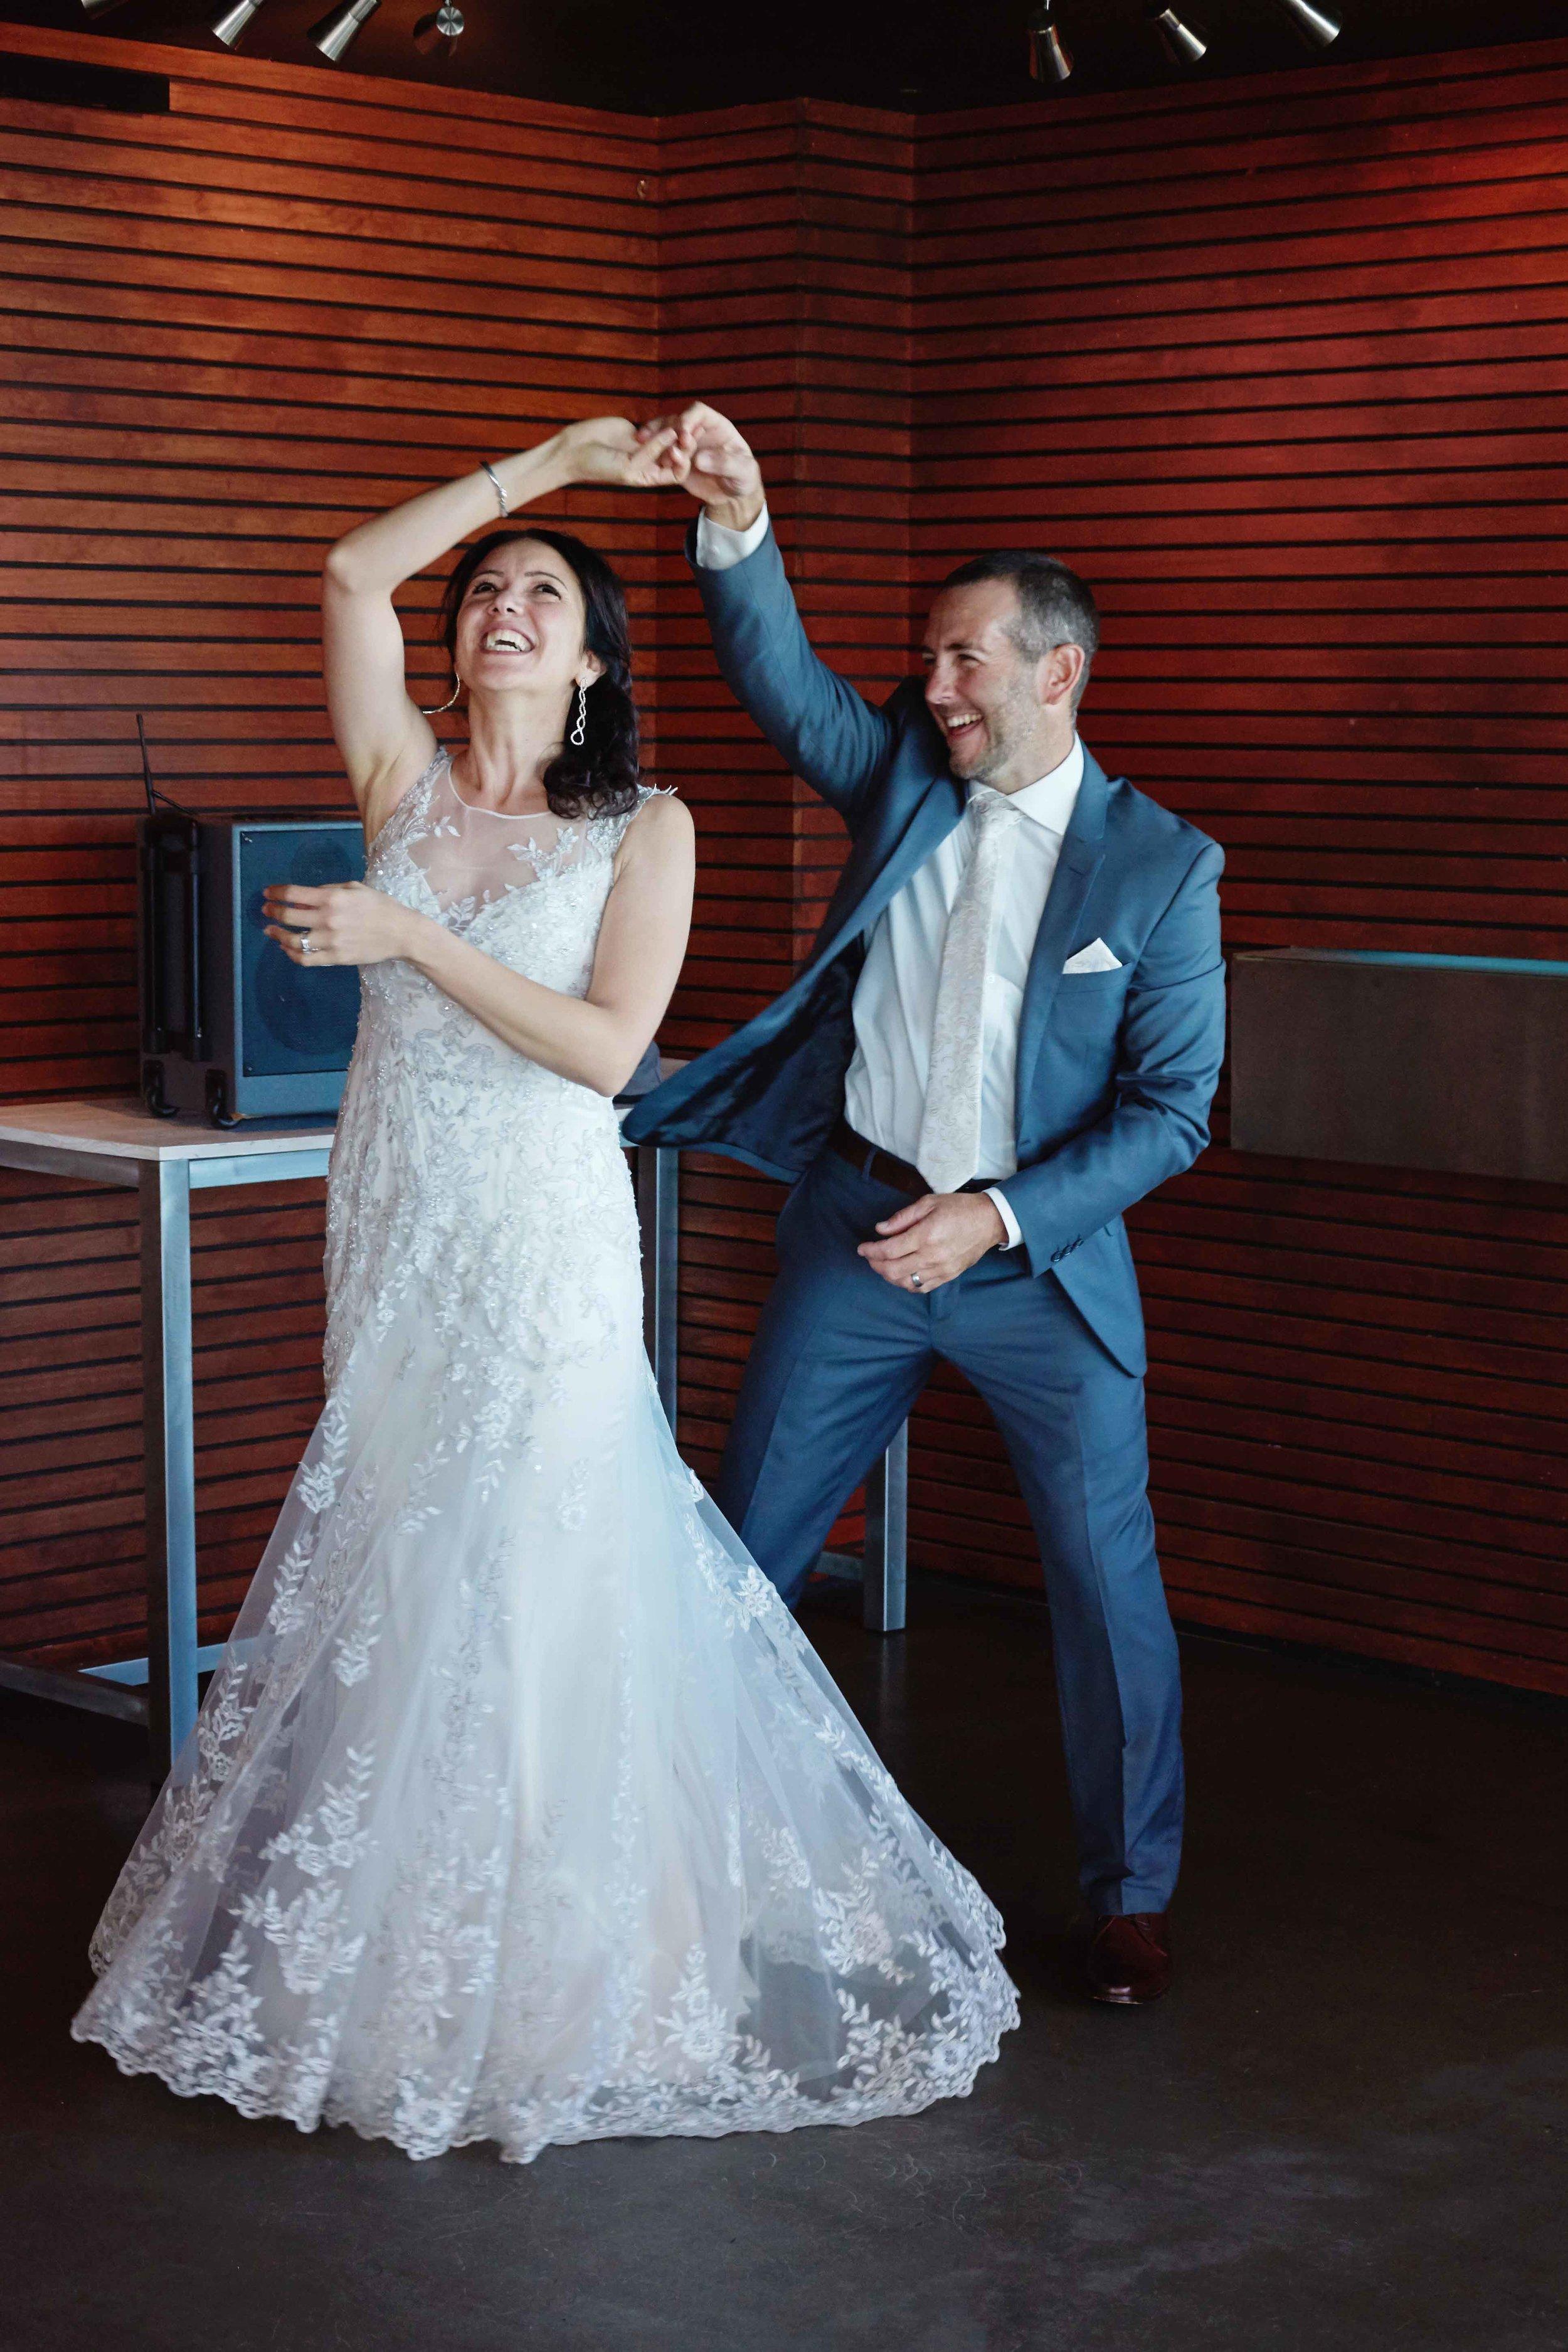 sorrento-wedding-photography-all-smiles-marissa-jade-photography-79.jpg